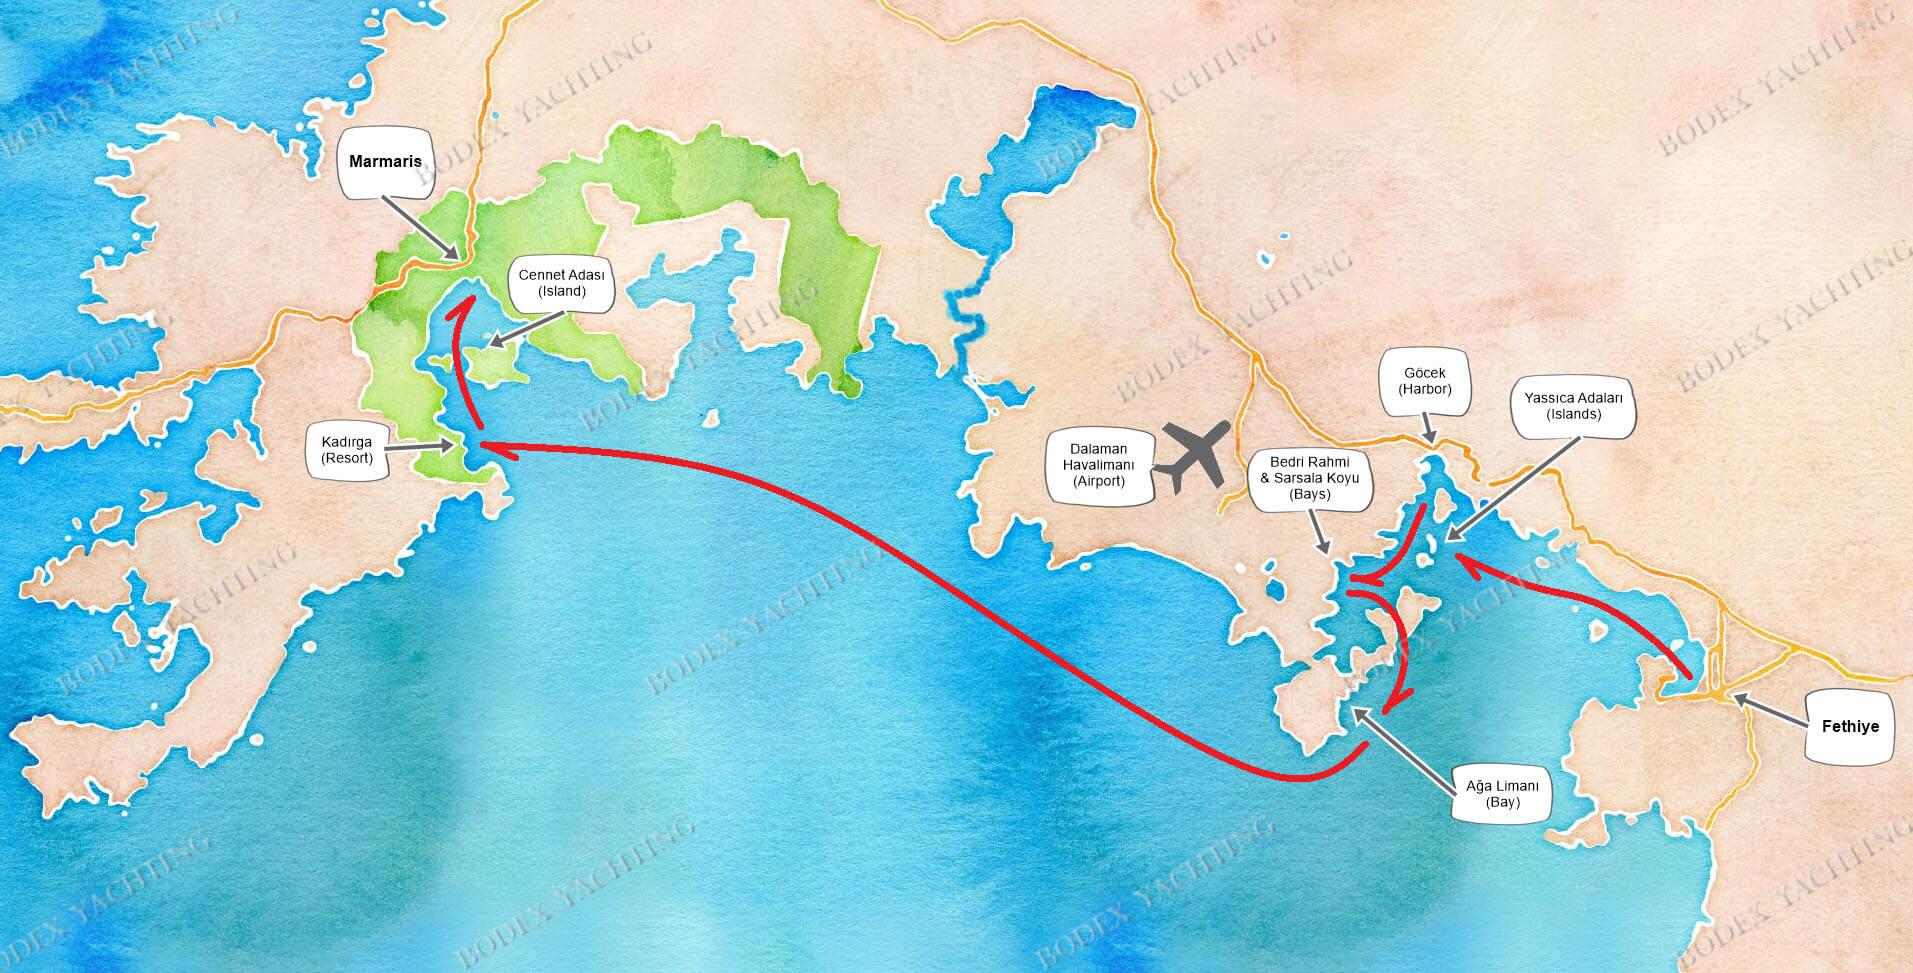 CABIN Charter - Fethiye to Marmaris